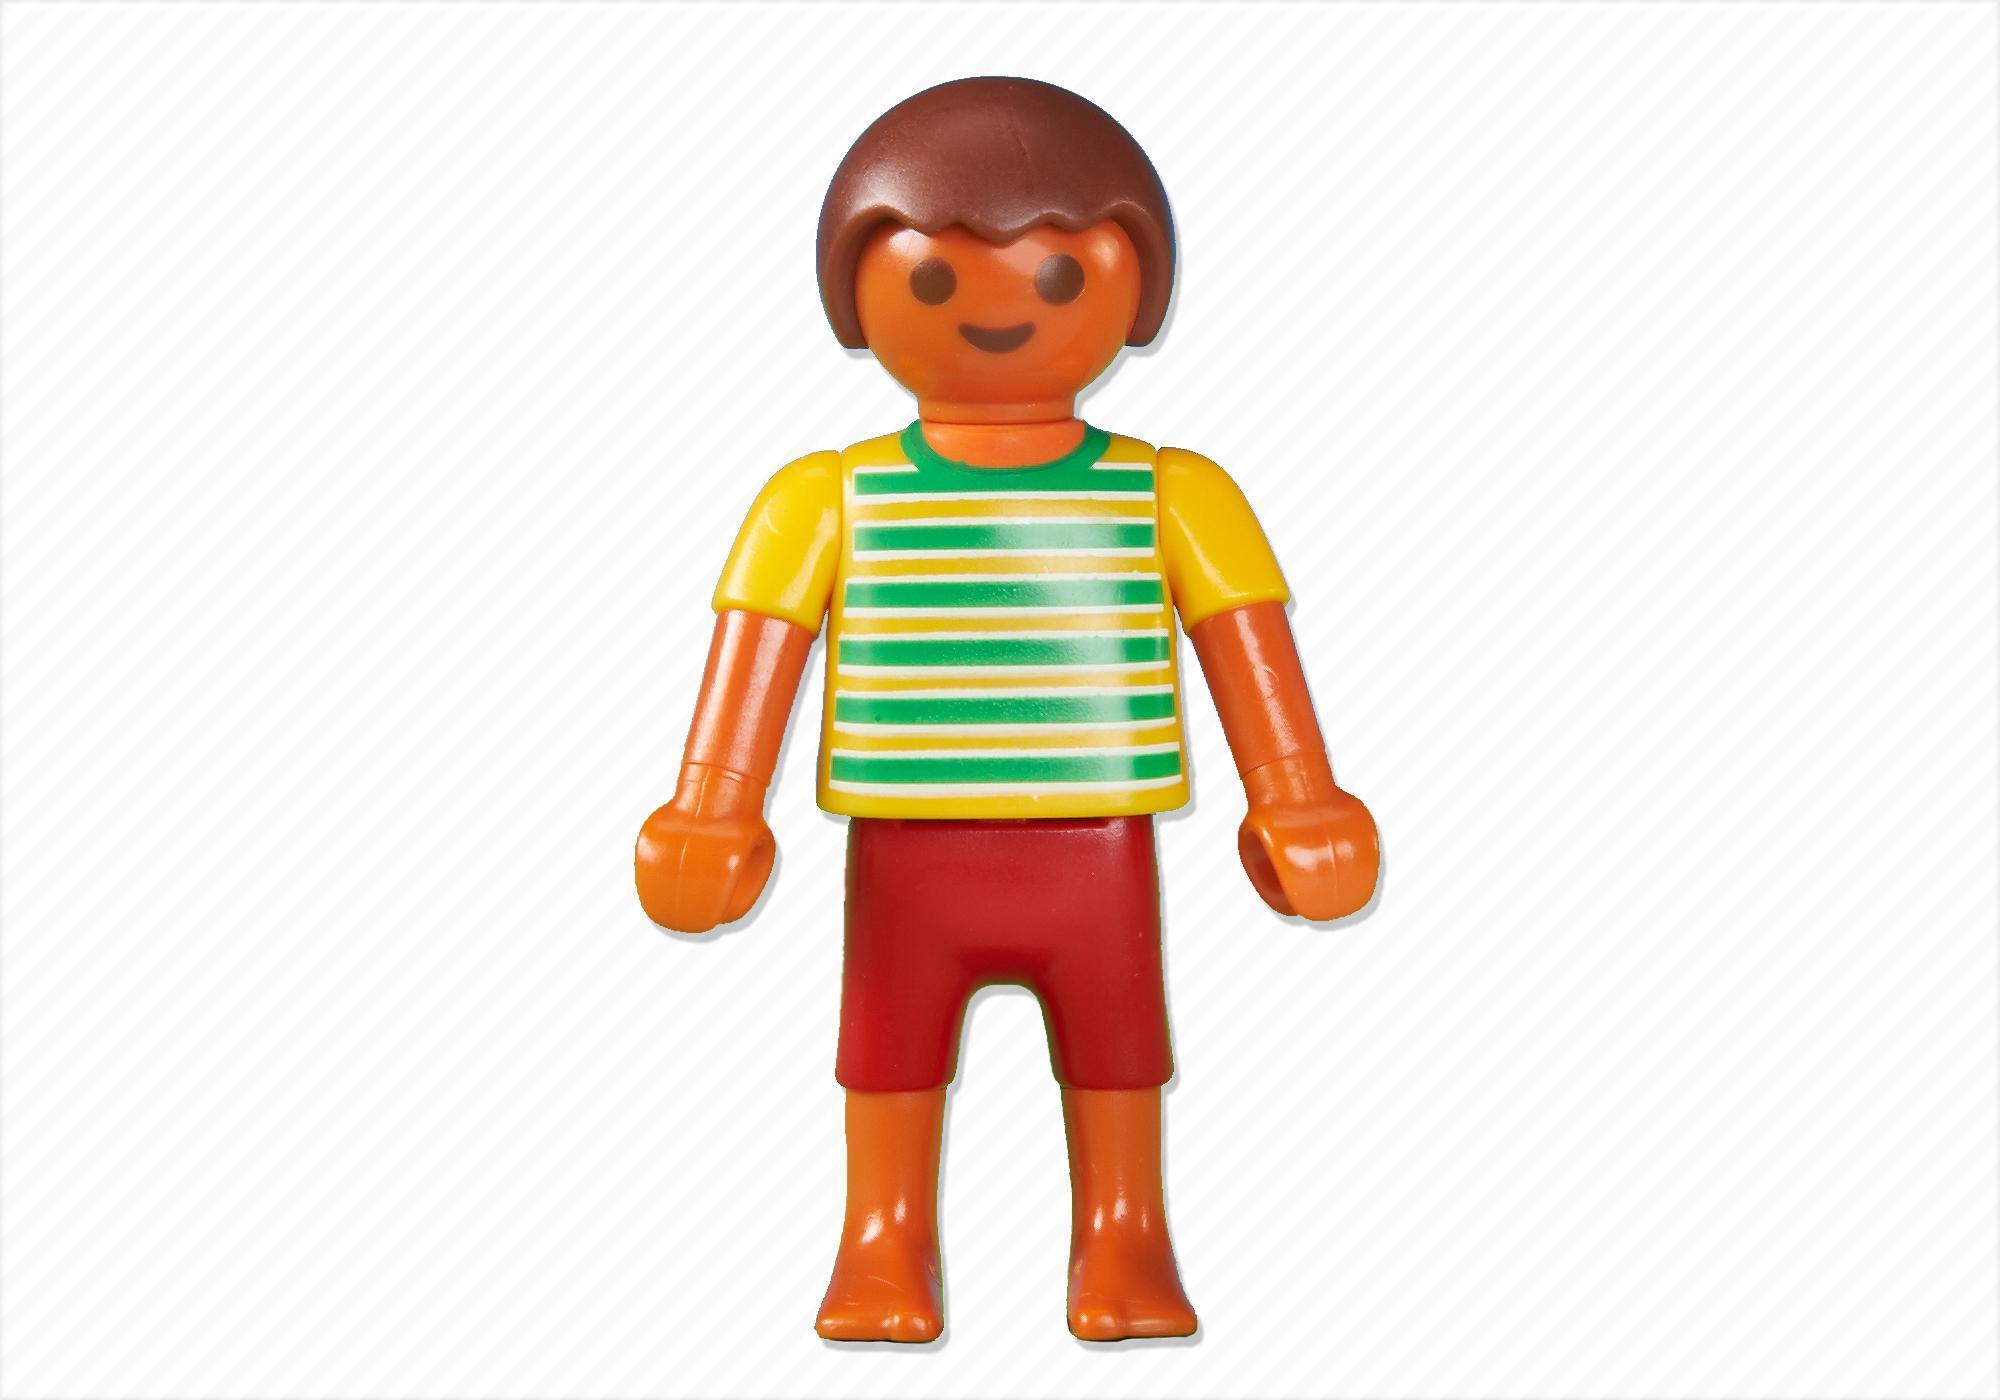 http://media.playmobil.com/i/playmobil/30101720_product_detail/Grundfigur Junge